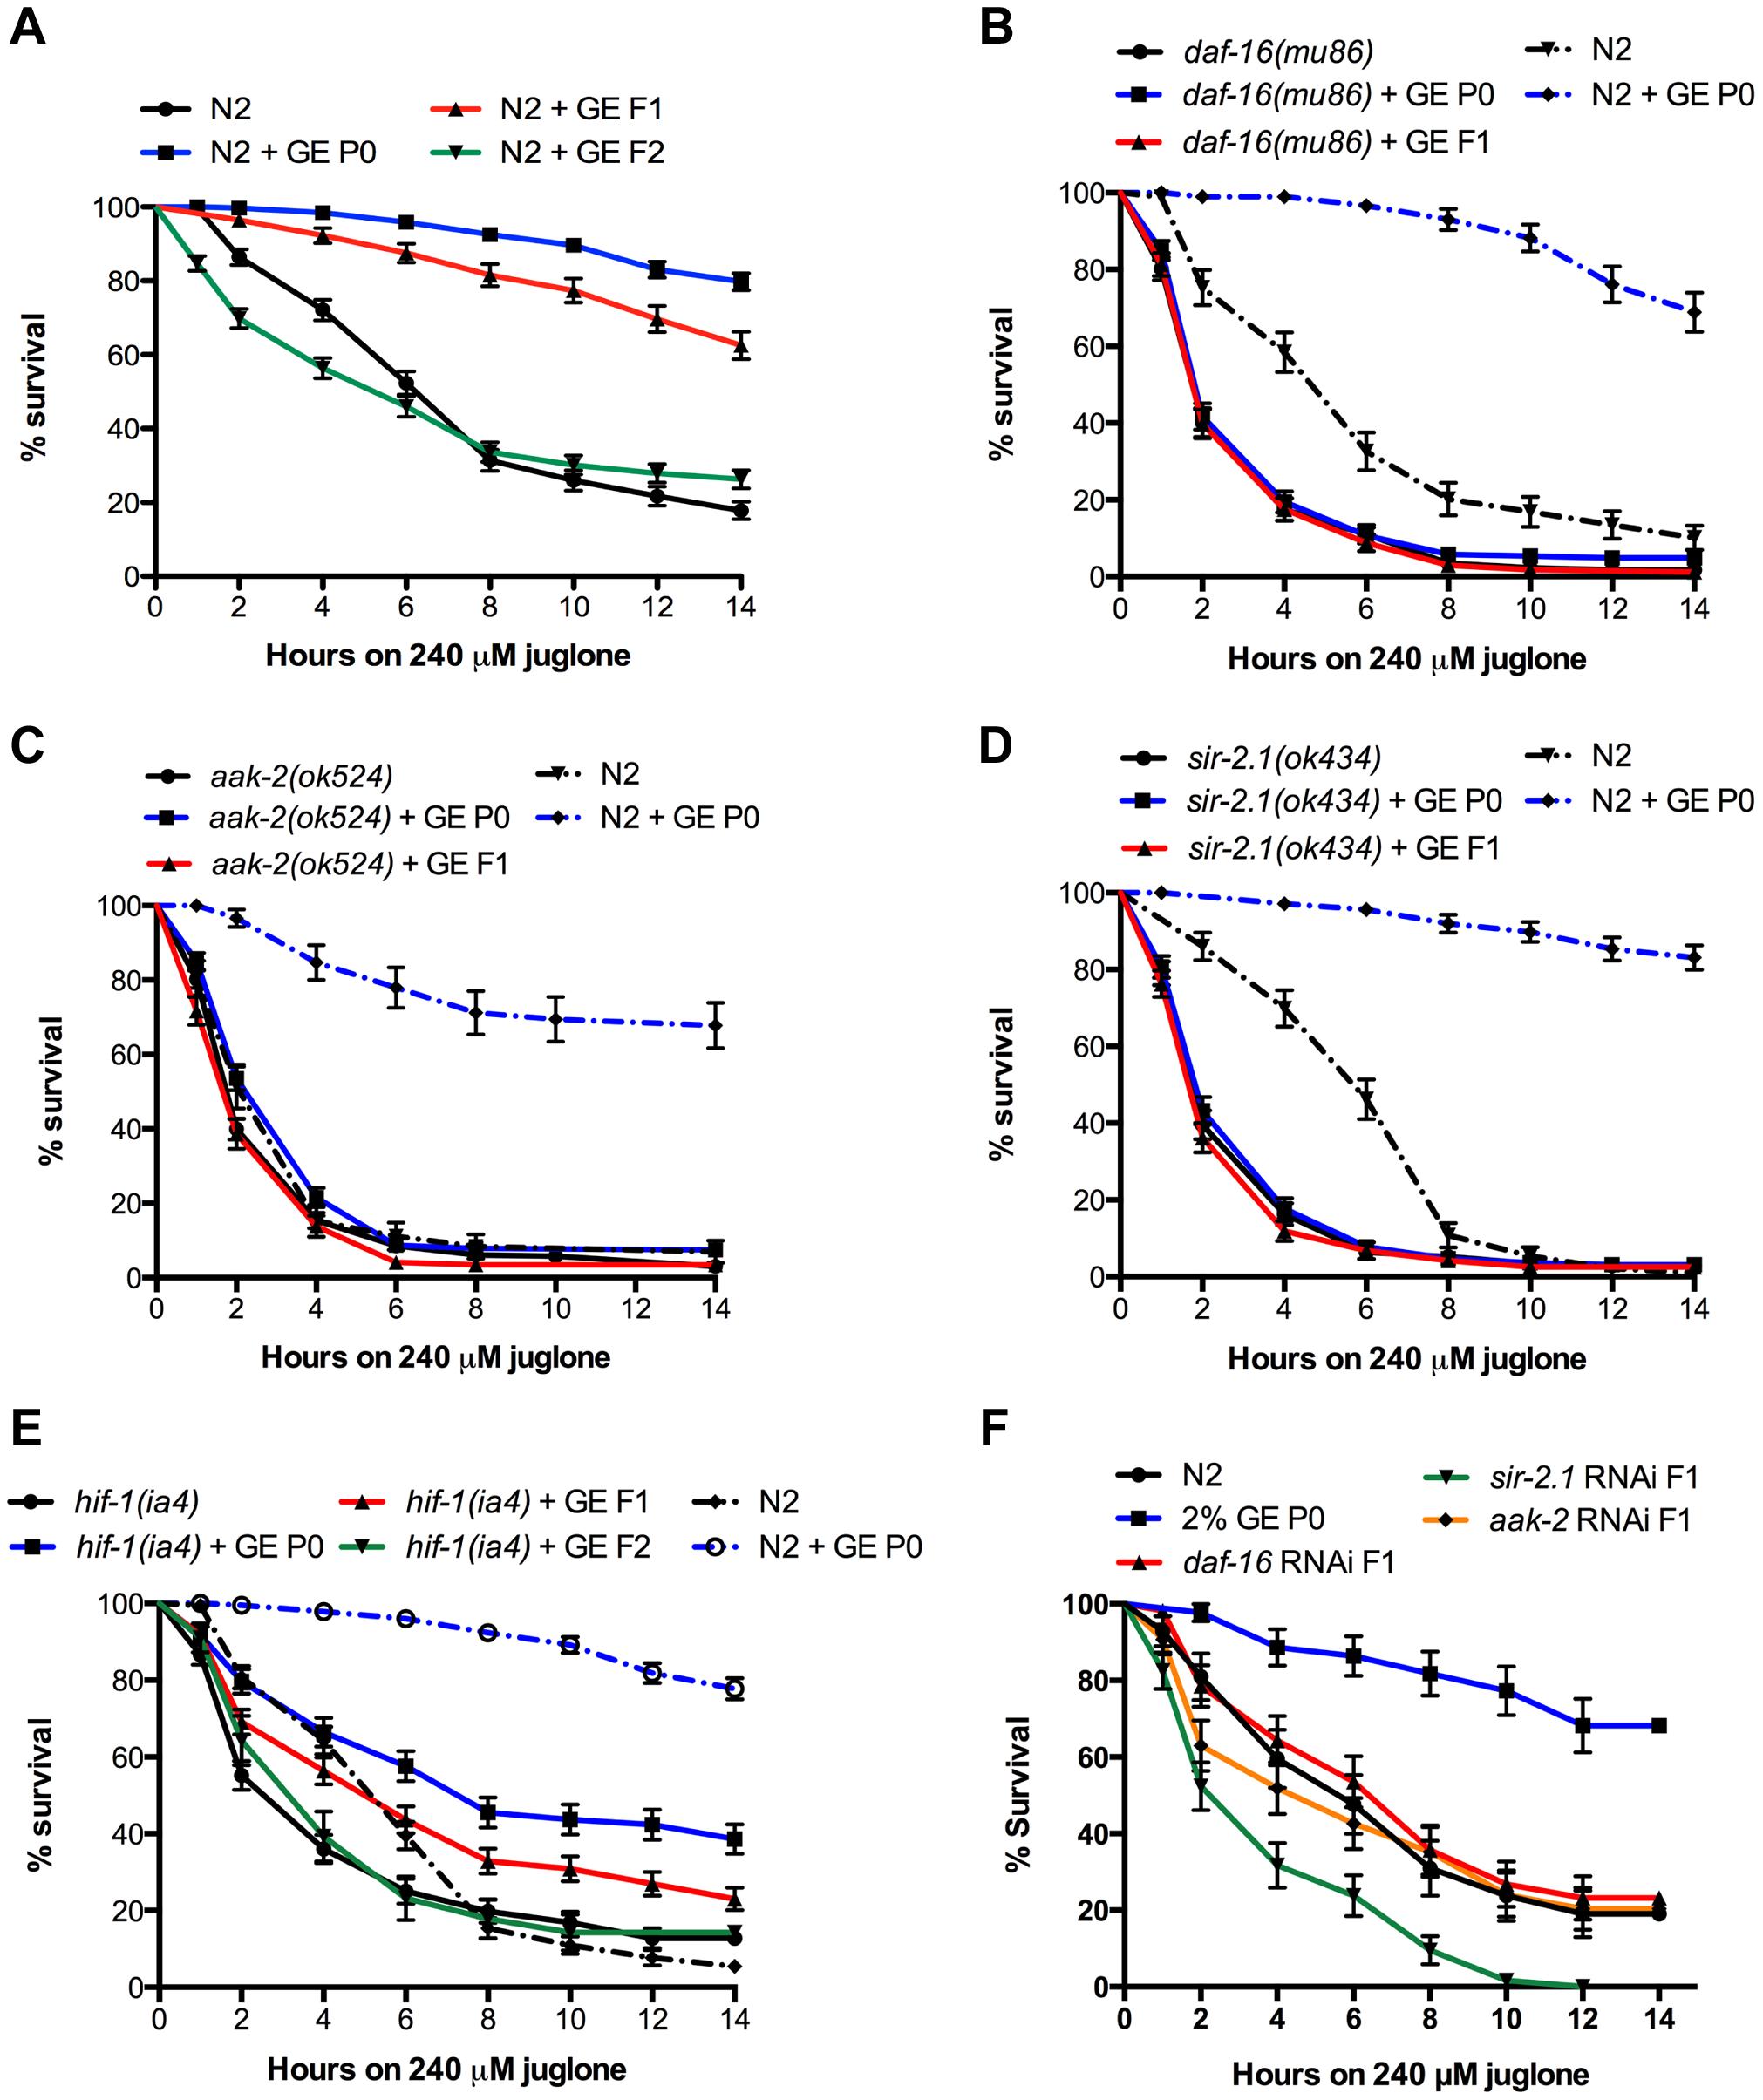 Transgenerational inheritance of resistance to oxidative stress.